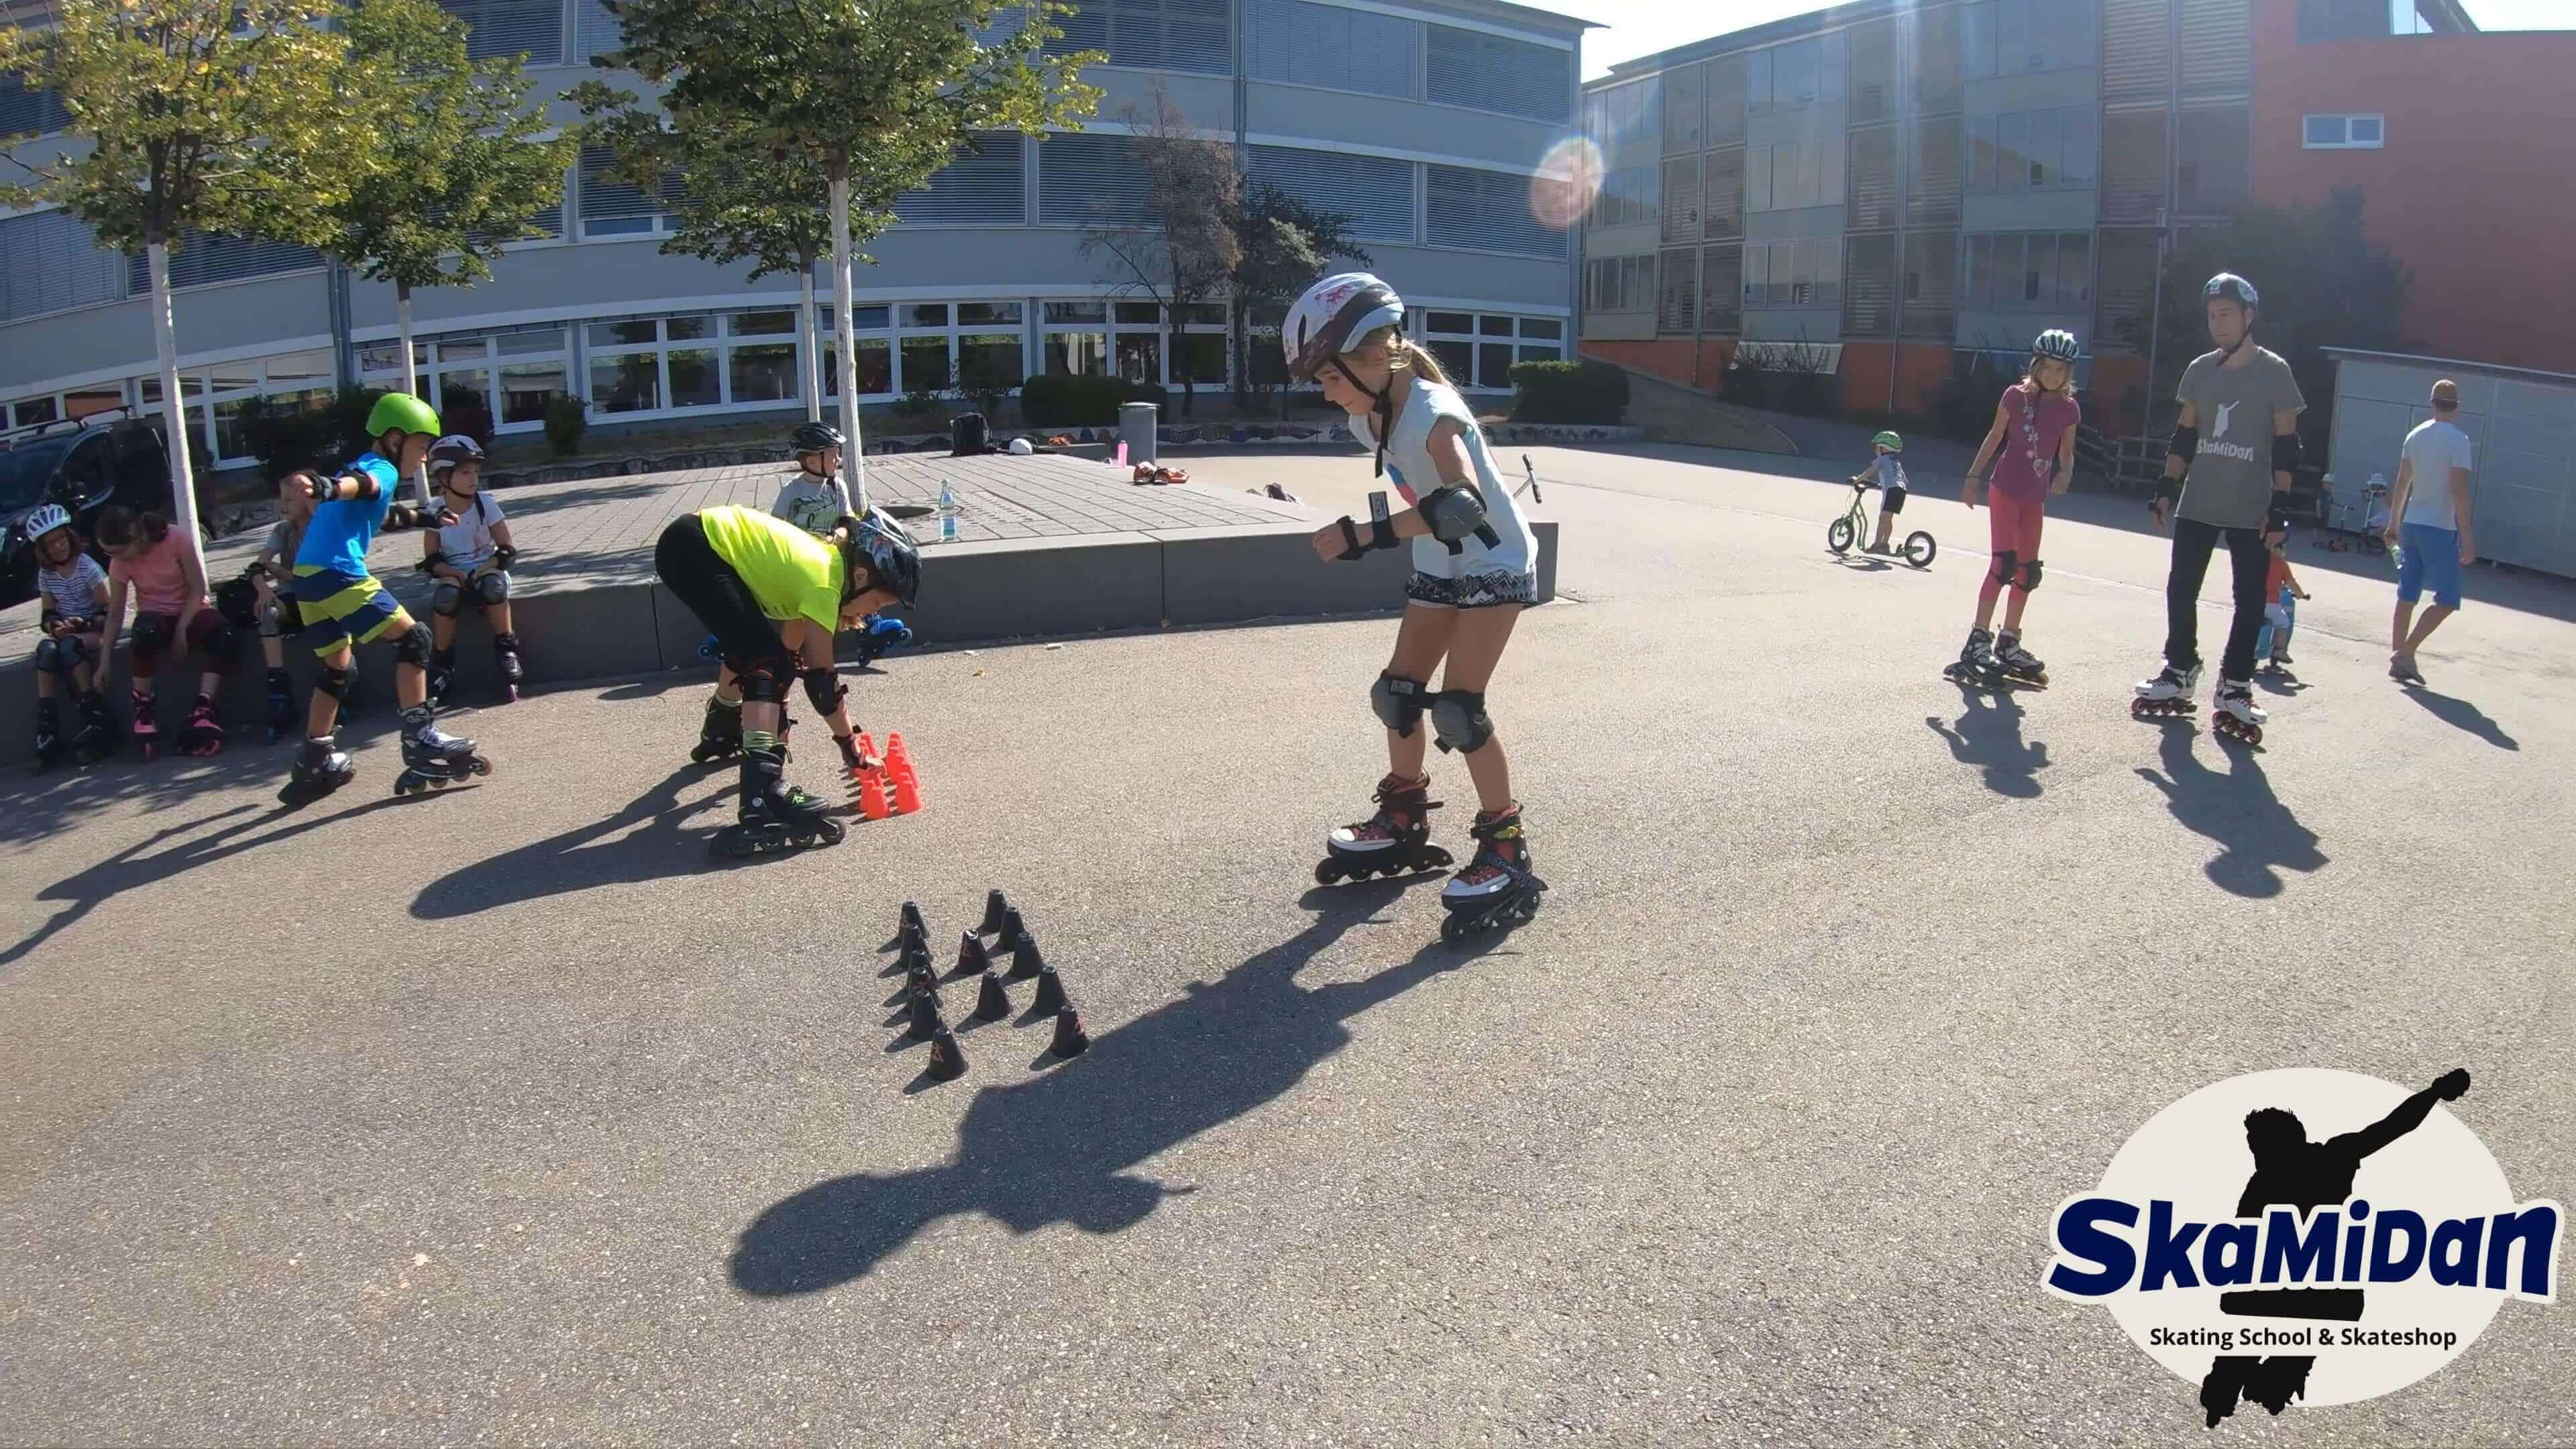 Donate now for good causes Lörrach Weil am Rhein Basel Skate school skating school SkaMiDan and skate shop skateshop SkaMiDan